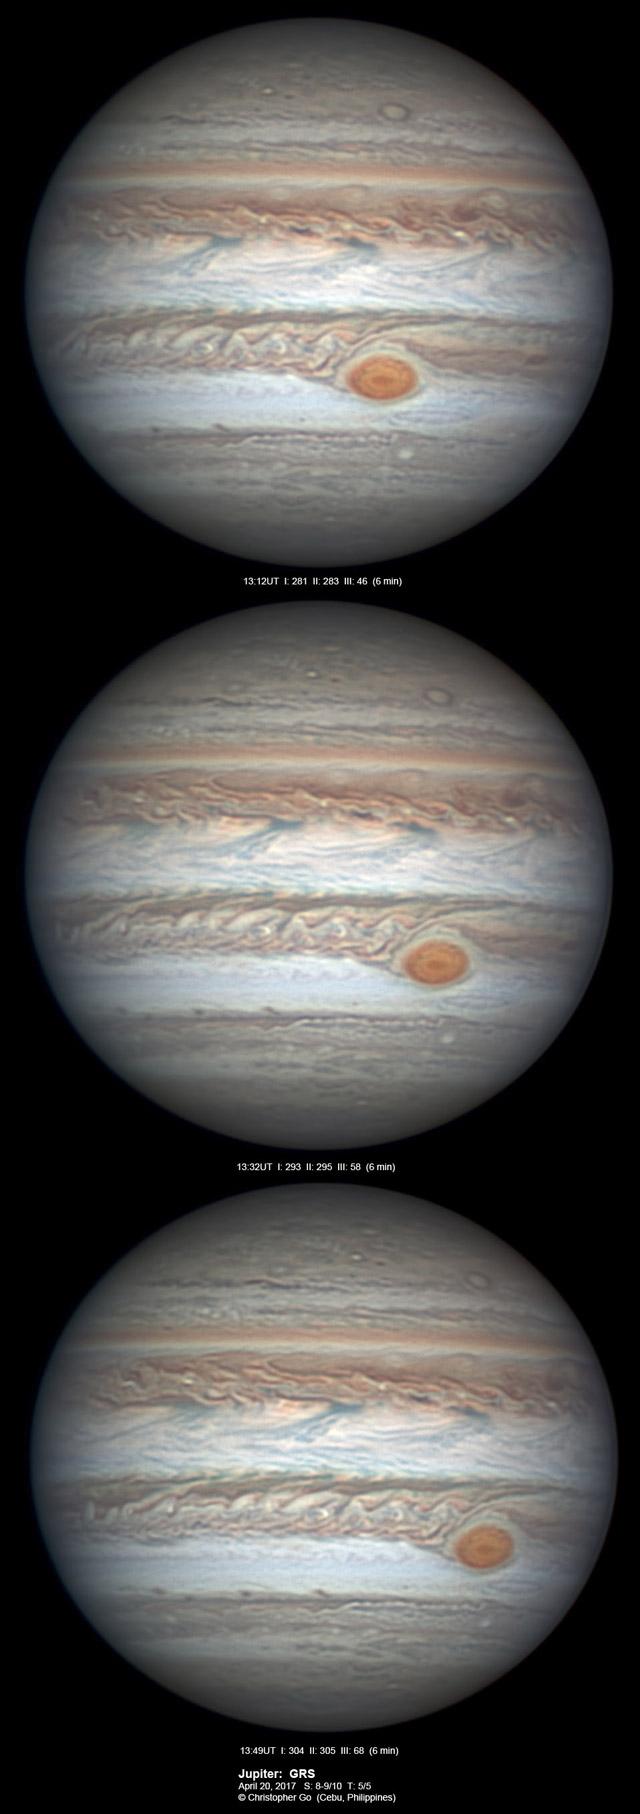 Jupiter on April 20, 2017